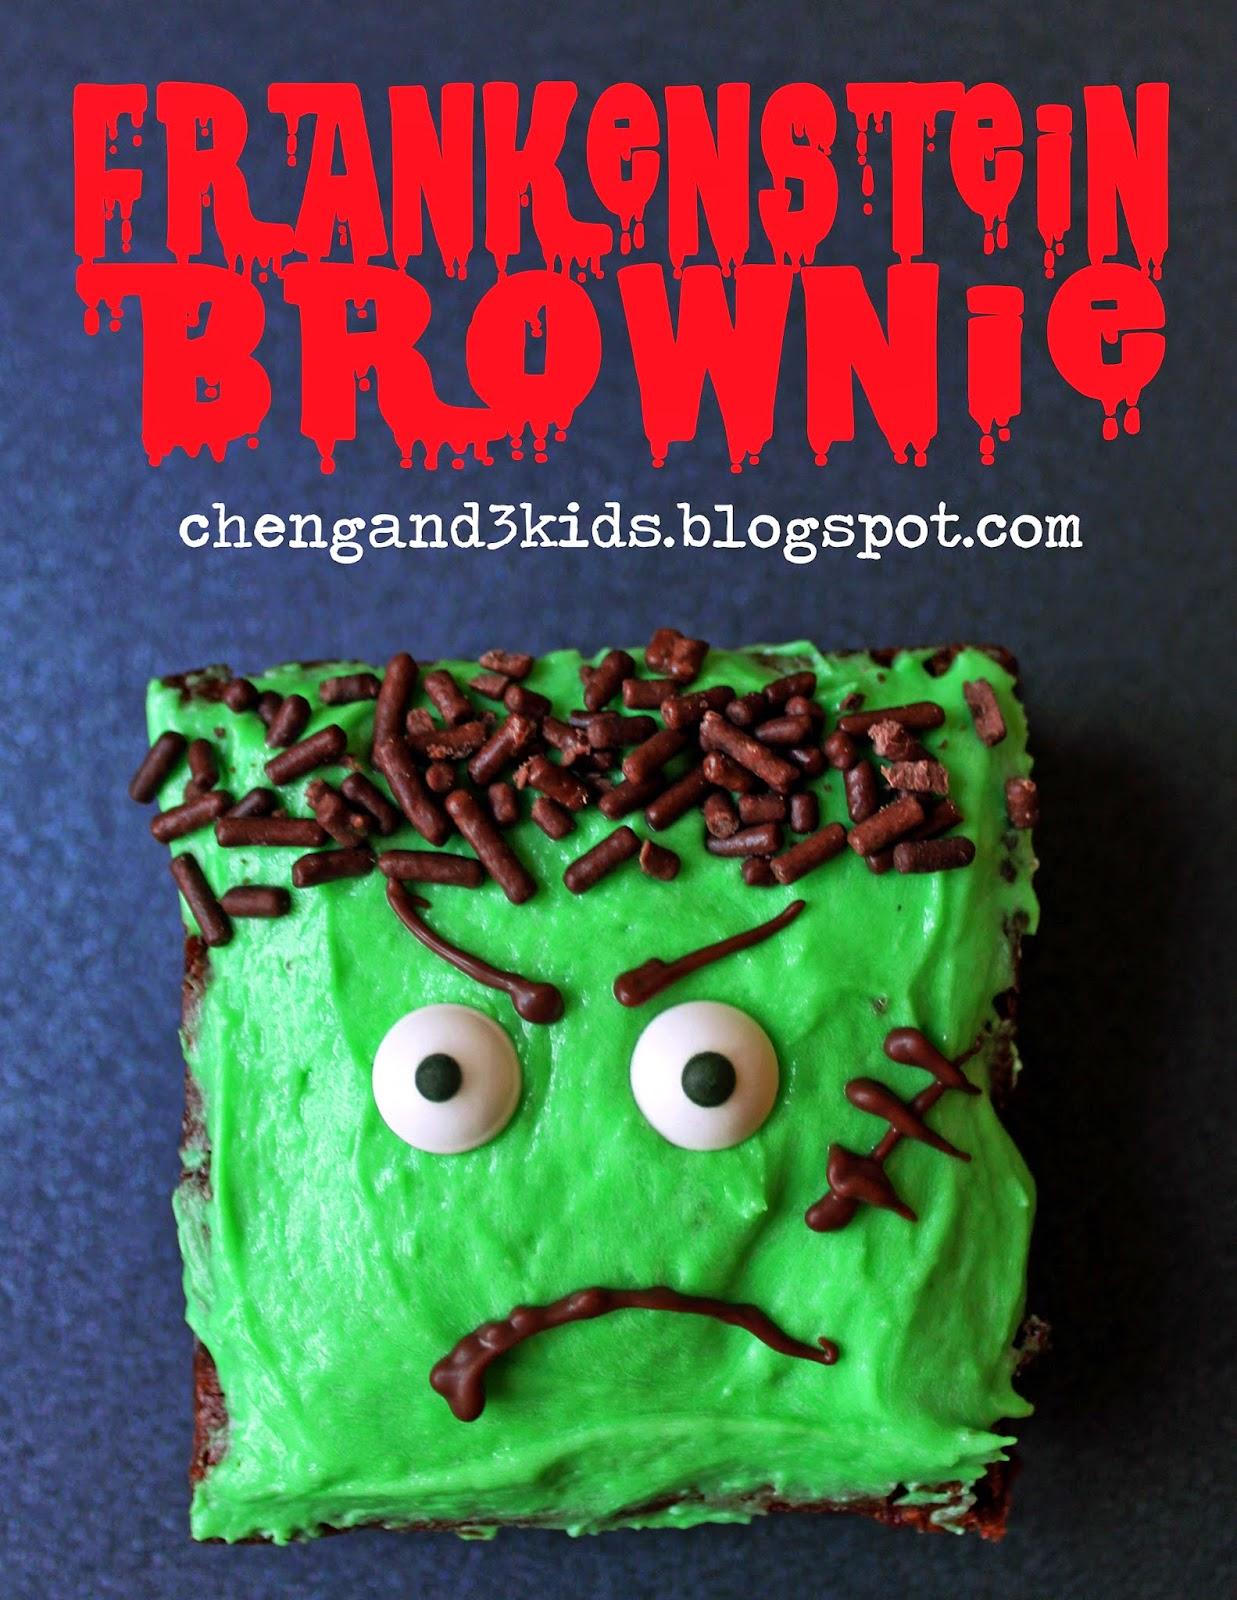 Frankenstein Brownie for Halloween by chengand3kids.blogspot.com